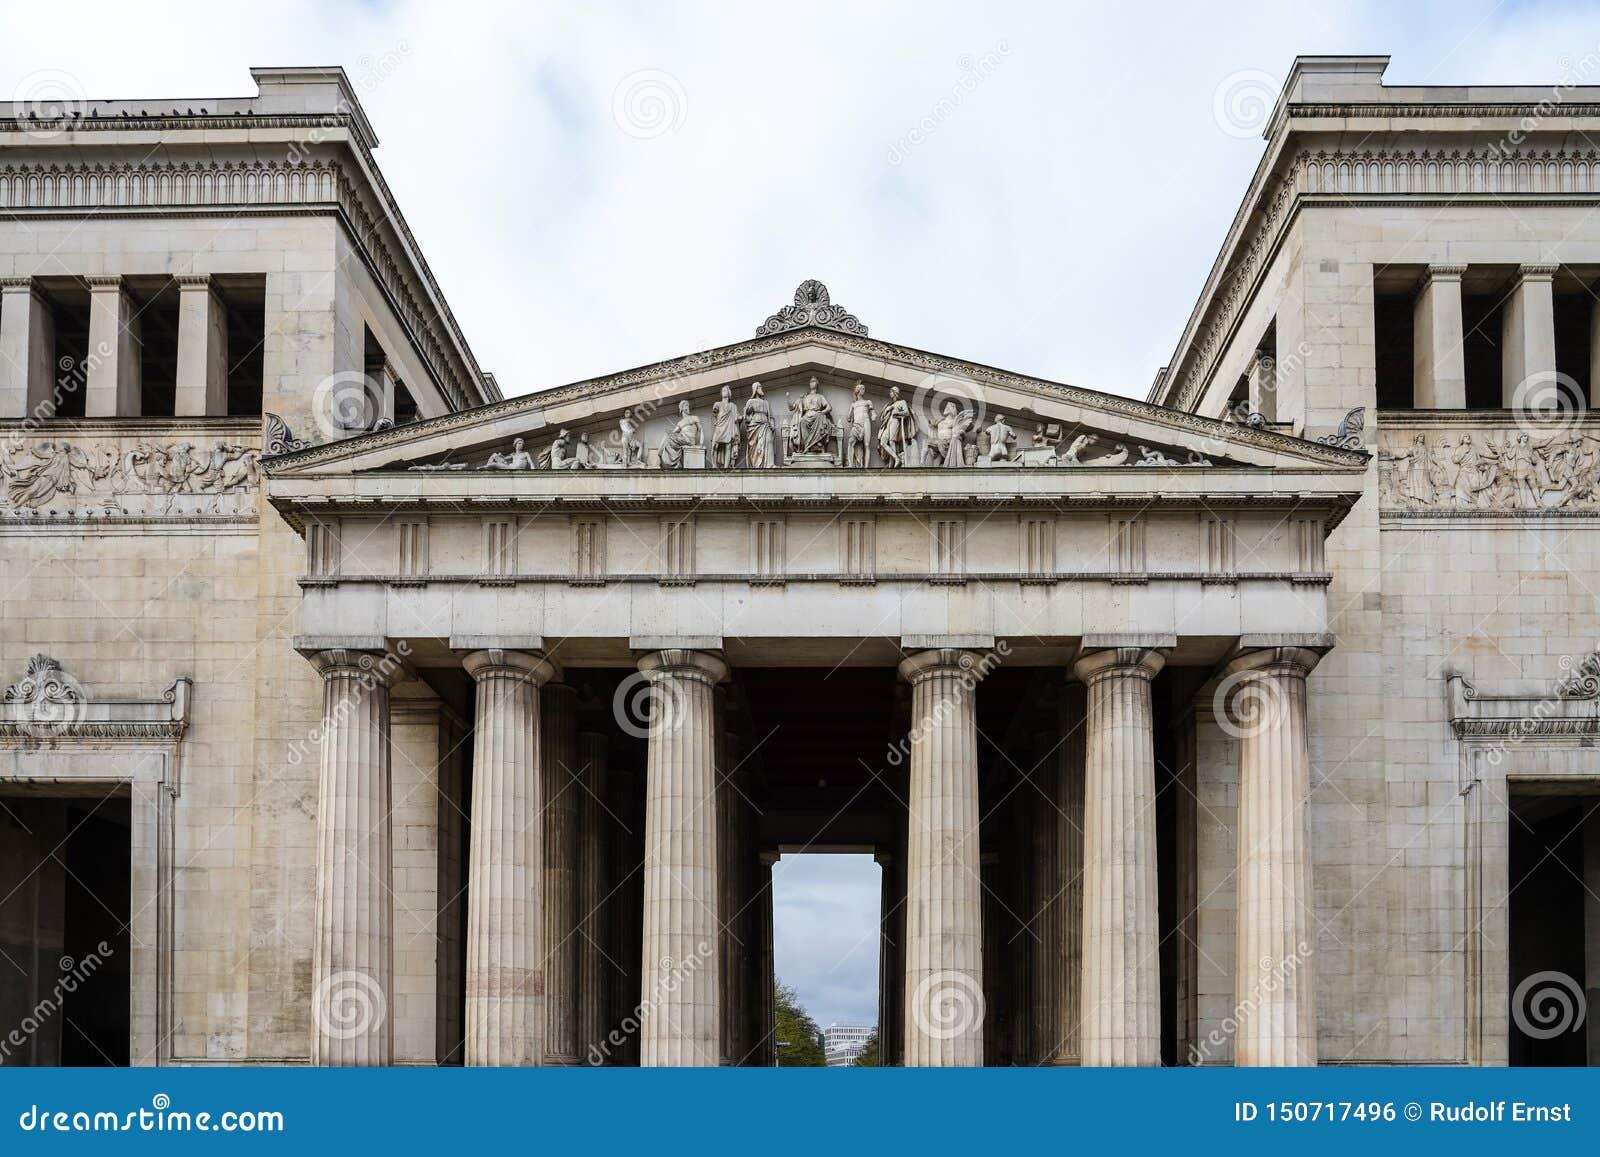 Konigsplatz - Square,国家资本慕尼黑,巴伐利亚,慕尼黑,德国国王